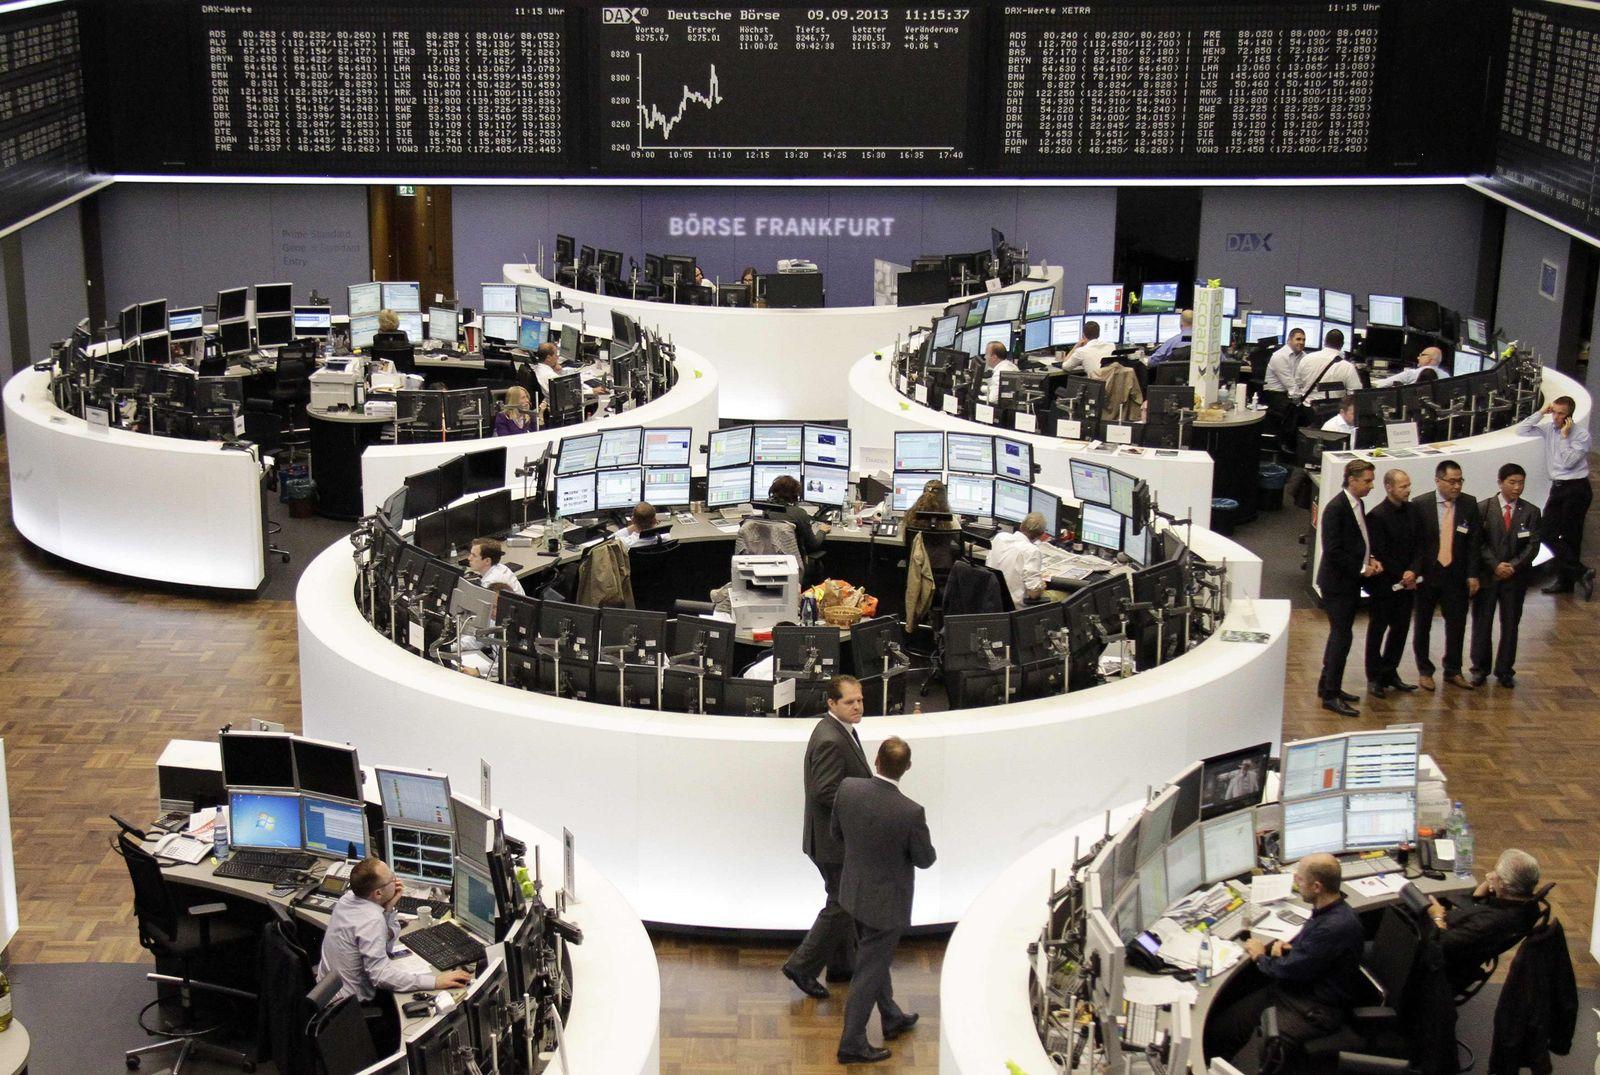 Börse Frankfurt / DAX / positiv / steigt